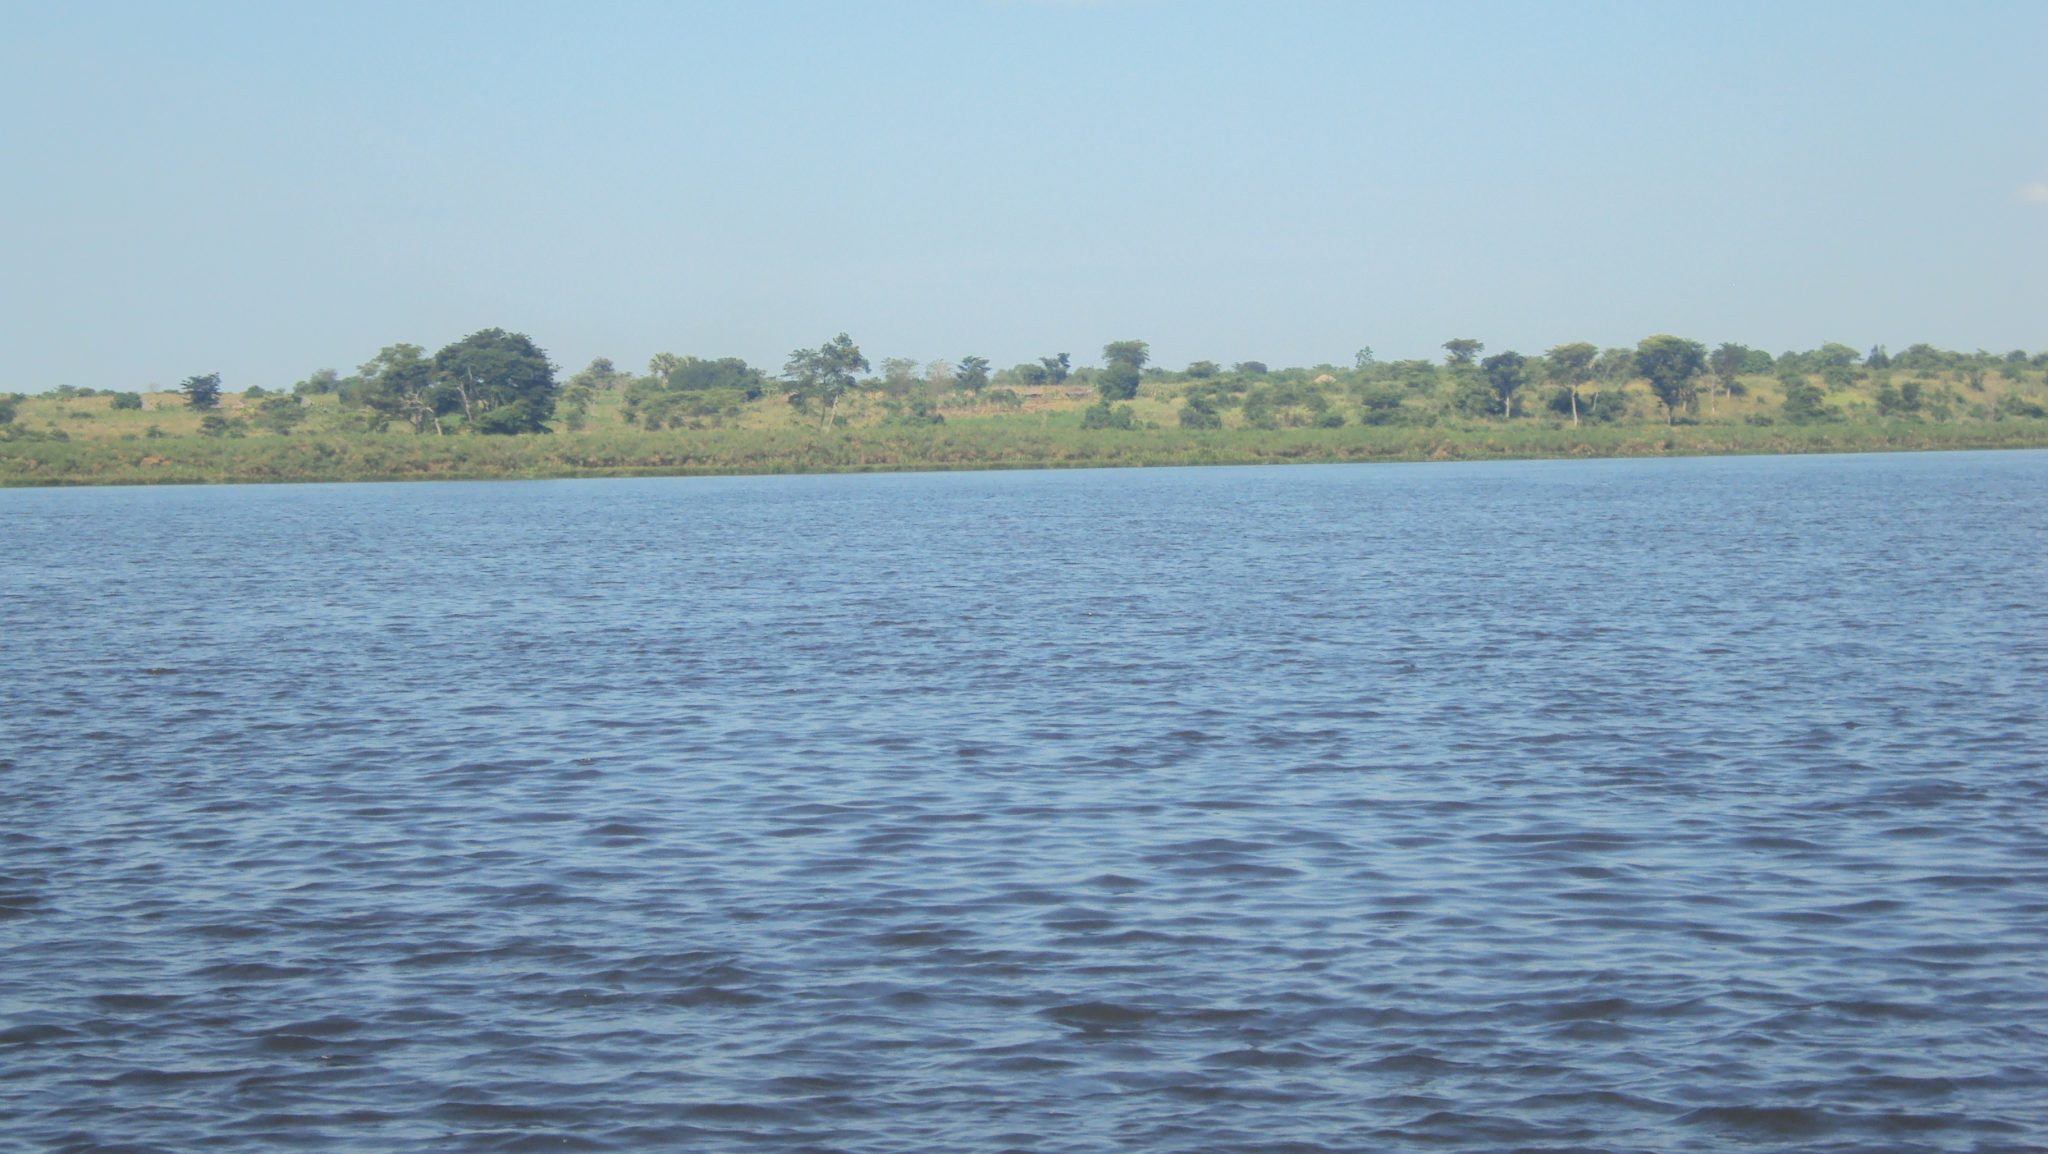 Lac Kyoga